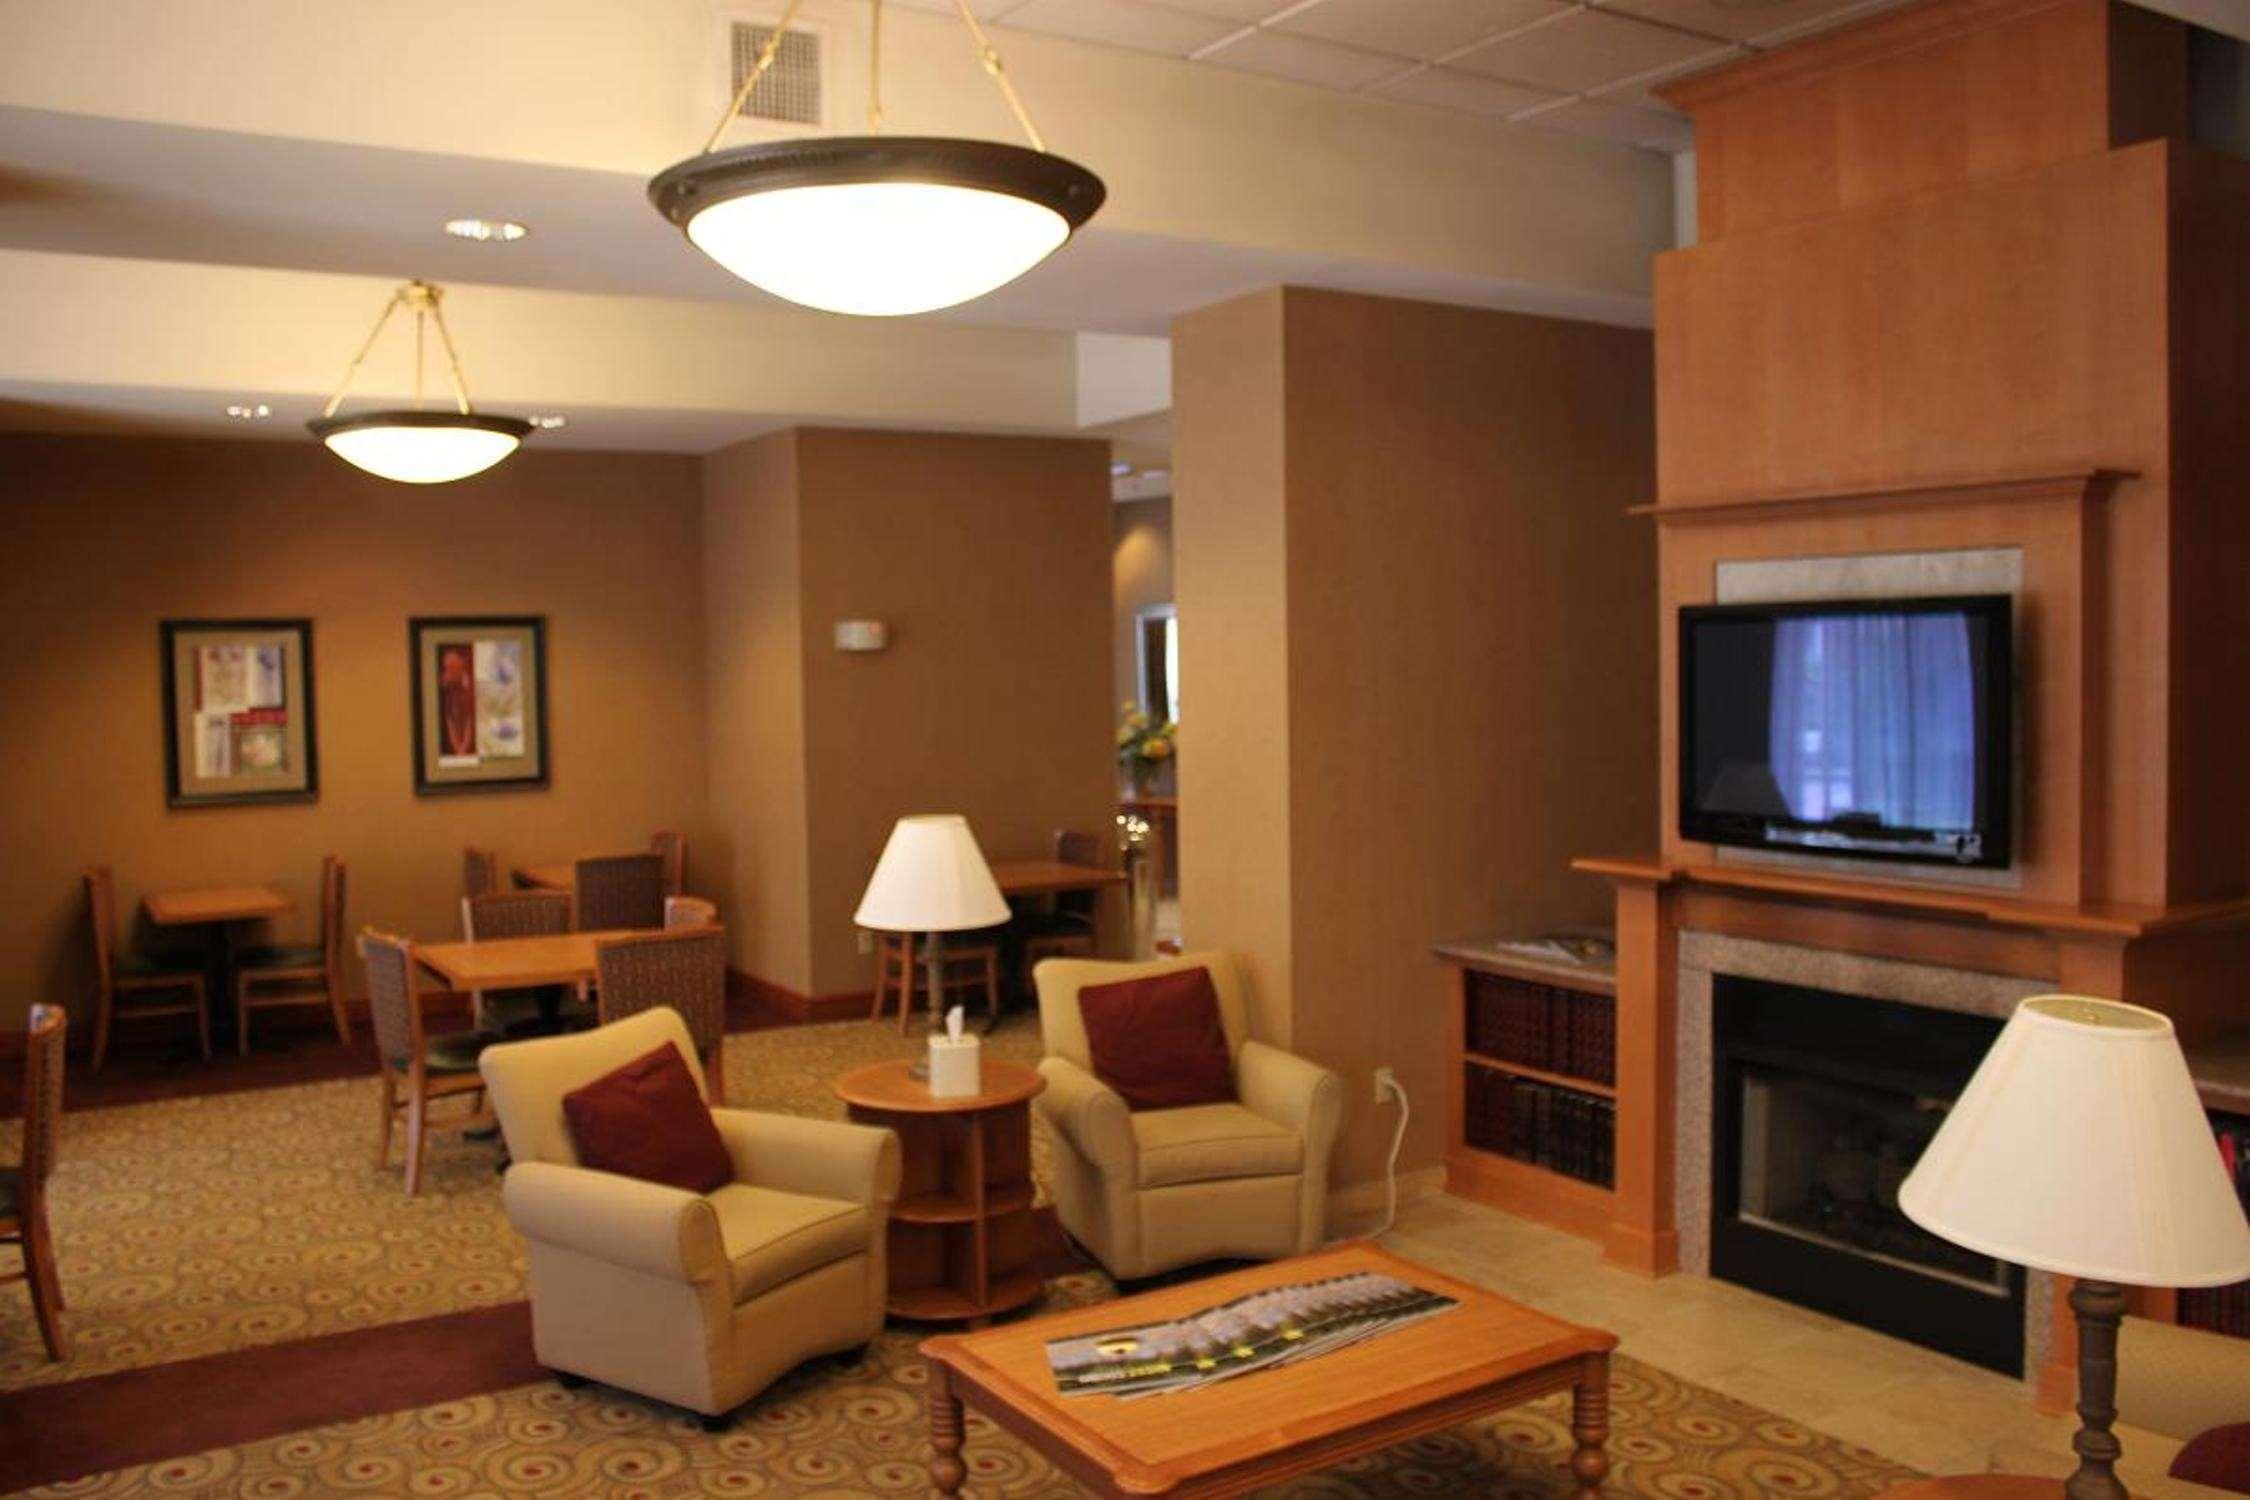 Hampton Inn & Suites Bremerton image 10